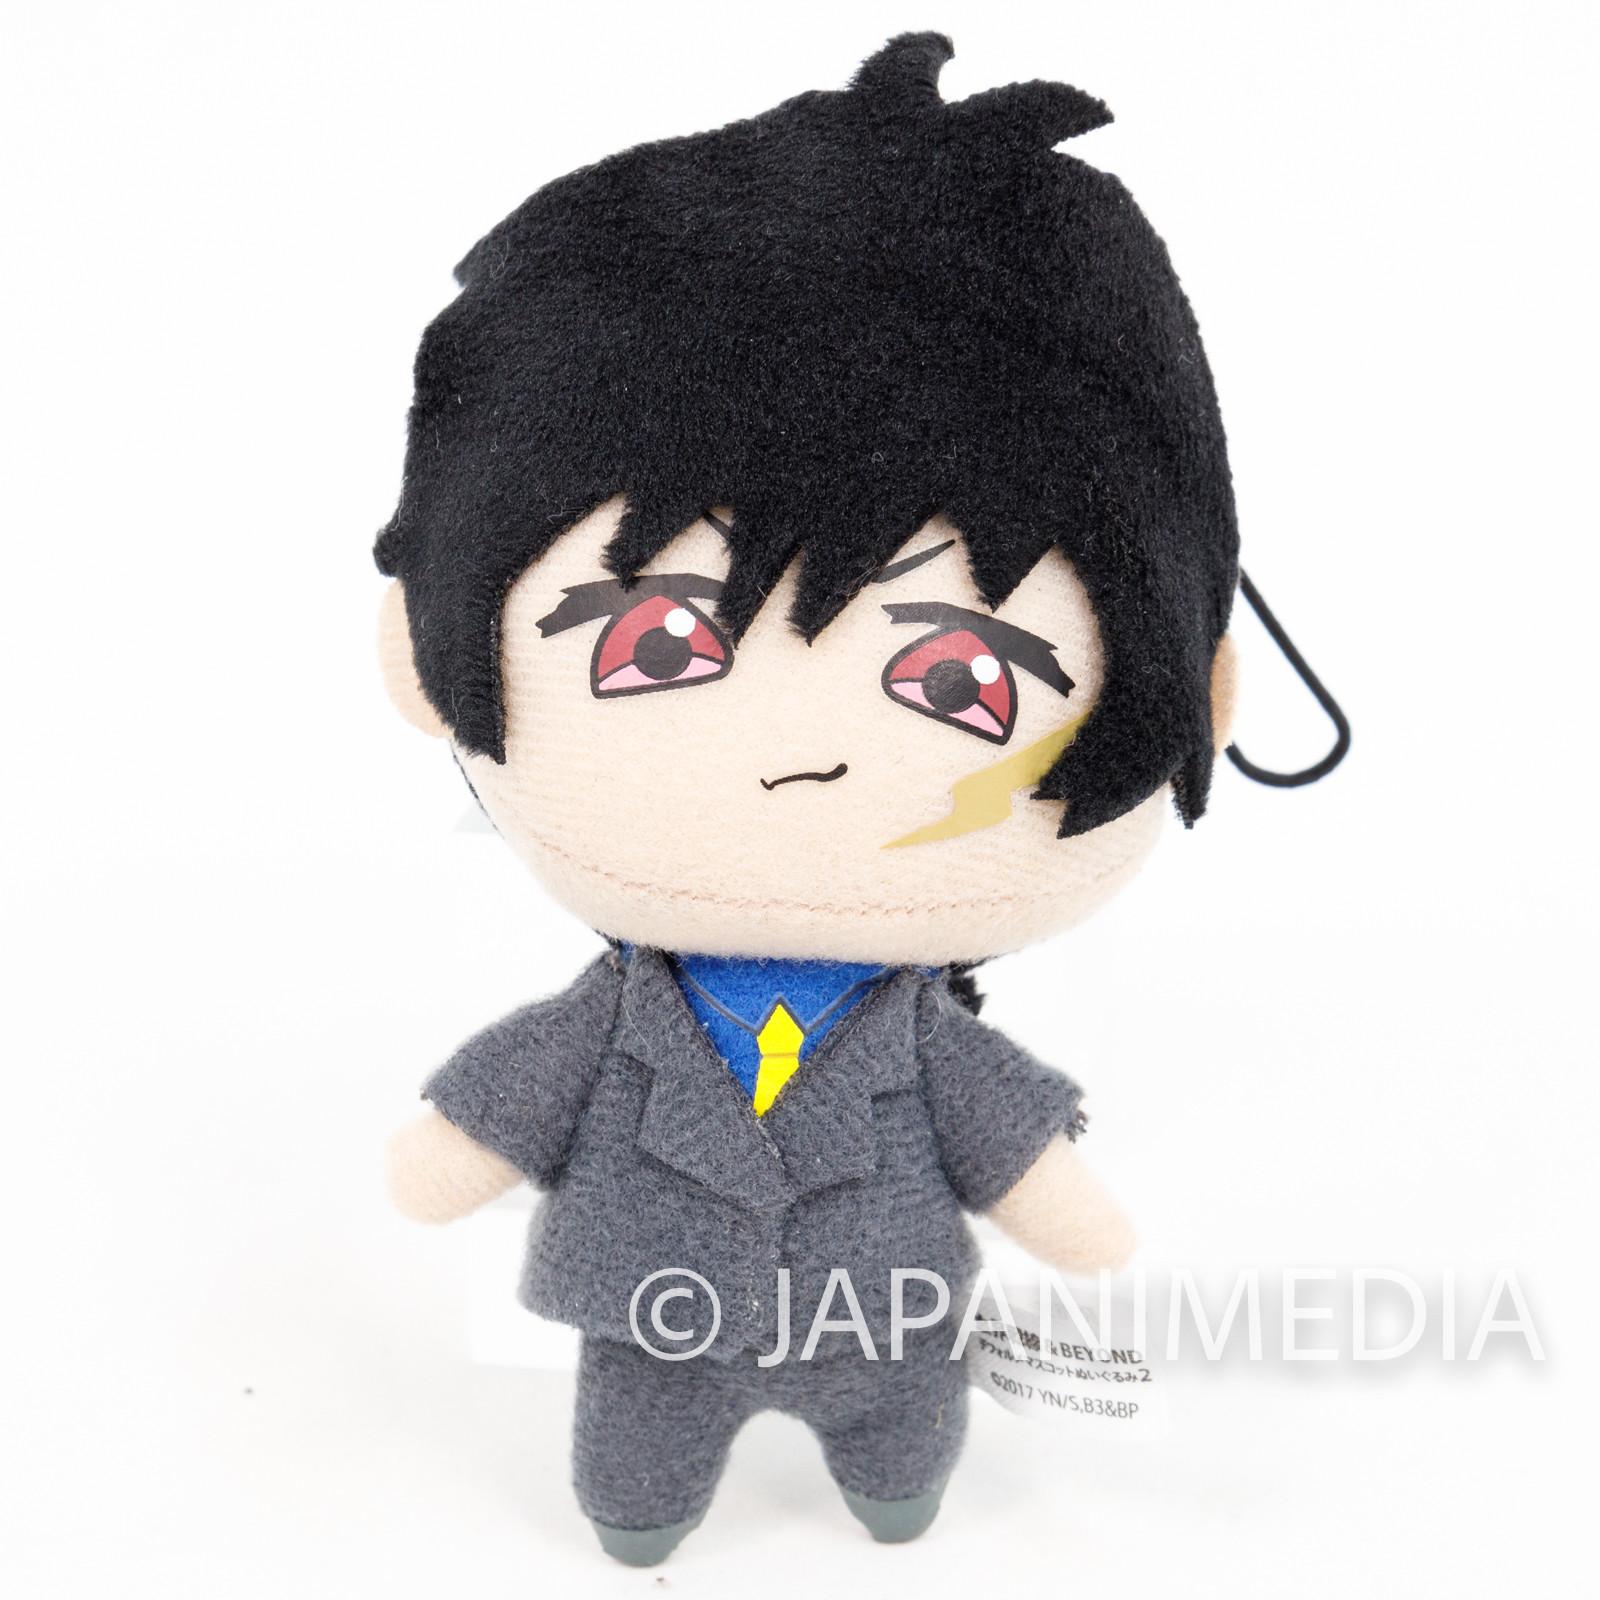 Blood Blockade Battlefront Steven A. Starphase Plush Doll JAPAN ANIME